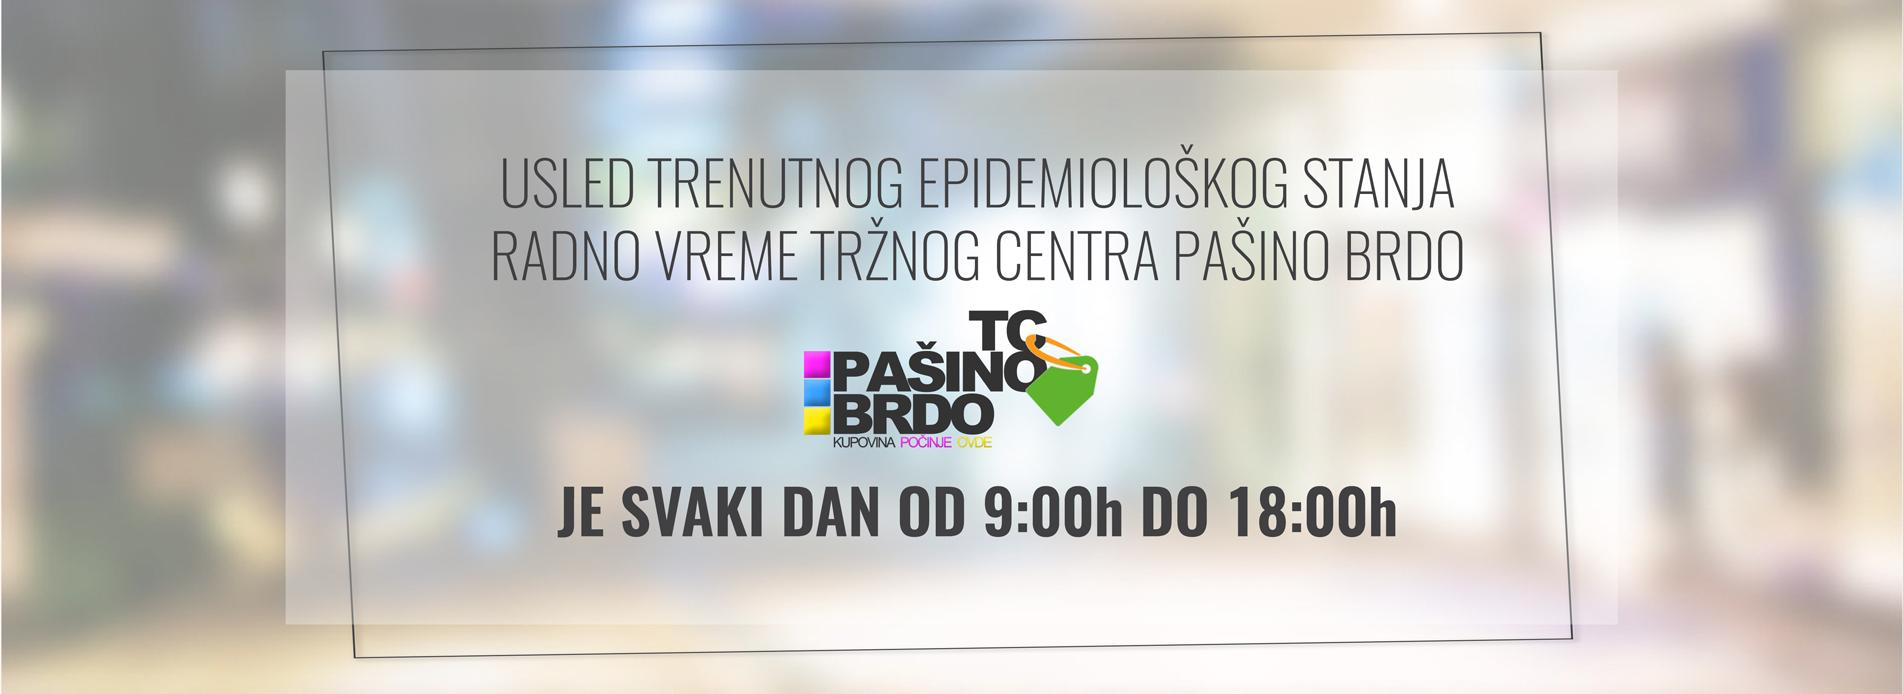 covid2019-radno-vreme-pb-18h